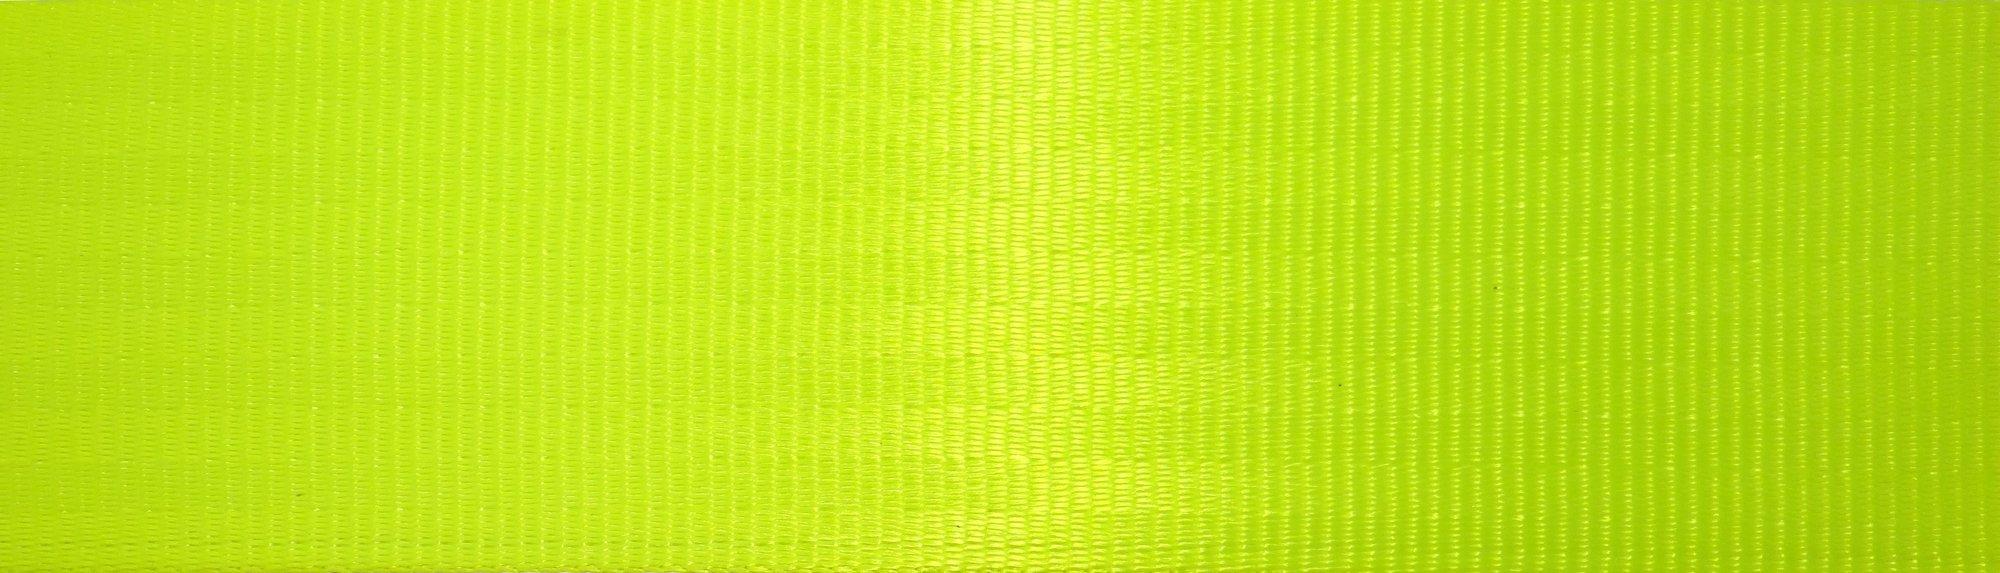 11 Panel Dayglo Yellow